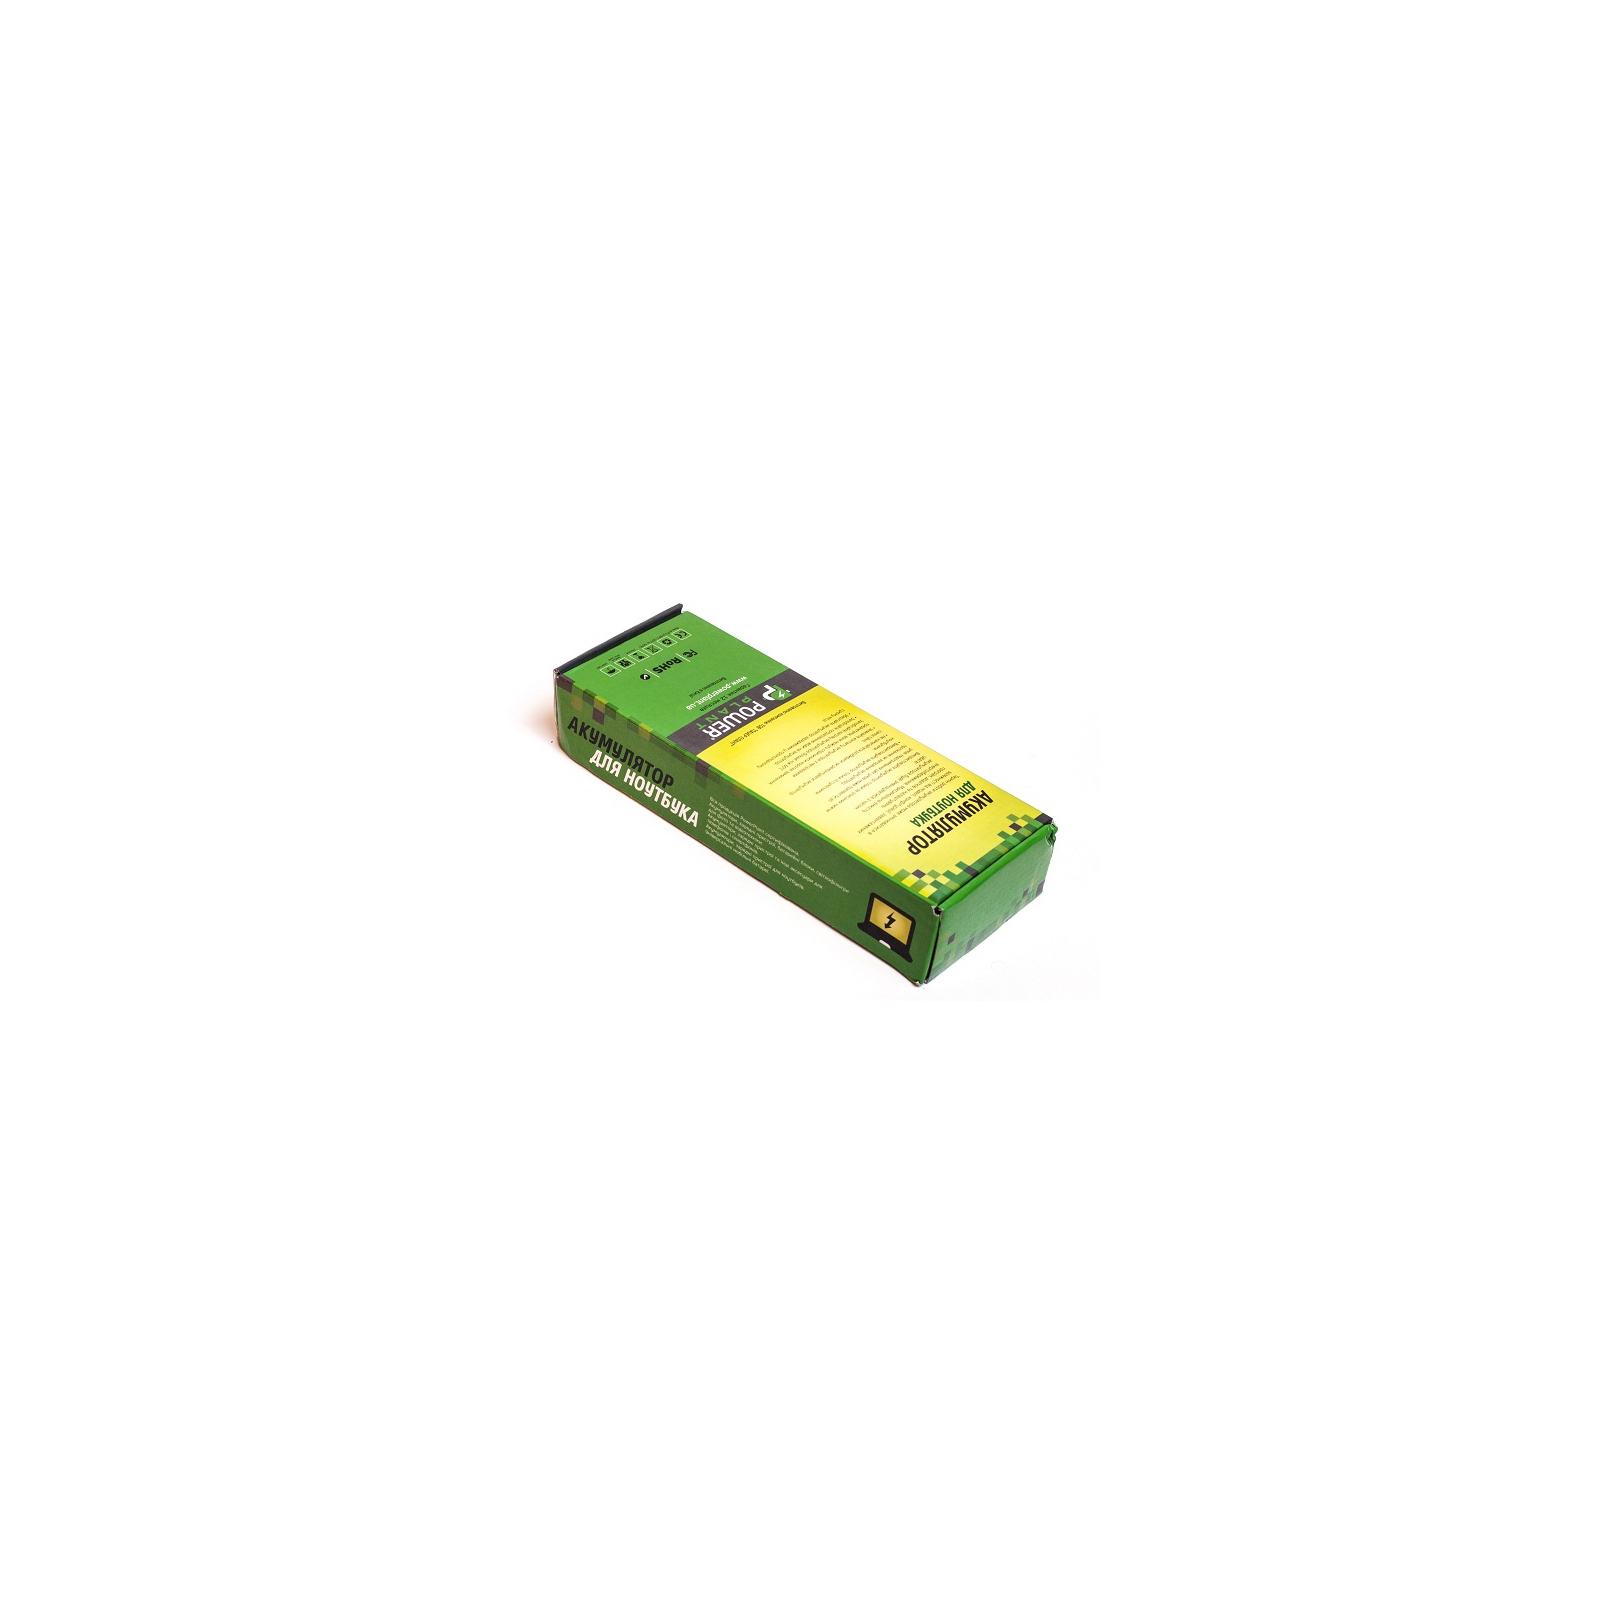 Аккумулятор для ноутбука DELL 1525 (RN873, DE 1525 3S2P) 11.1V 5200mAh PowerPlant (NB00000021) изображение 2